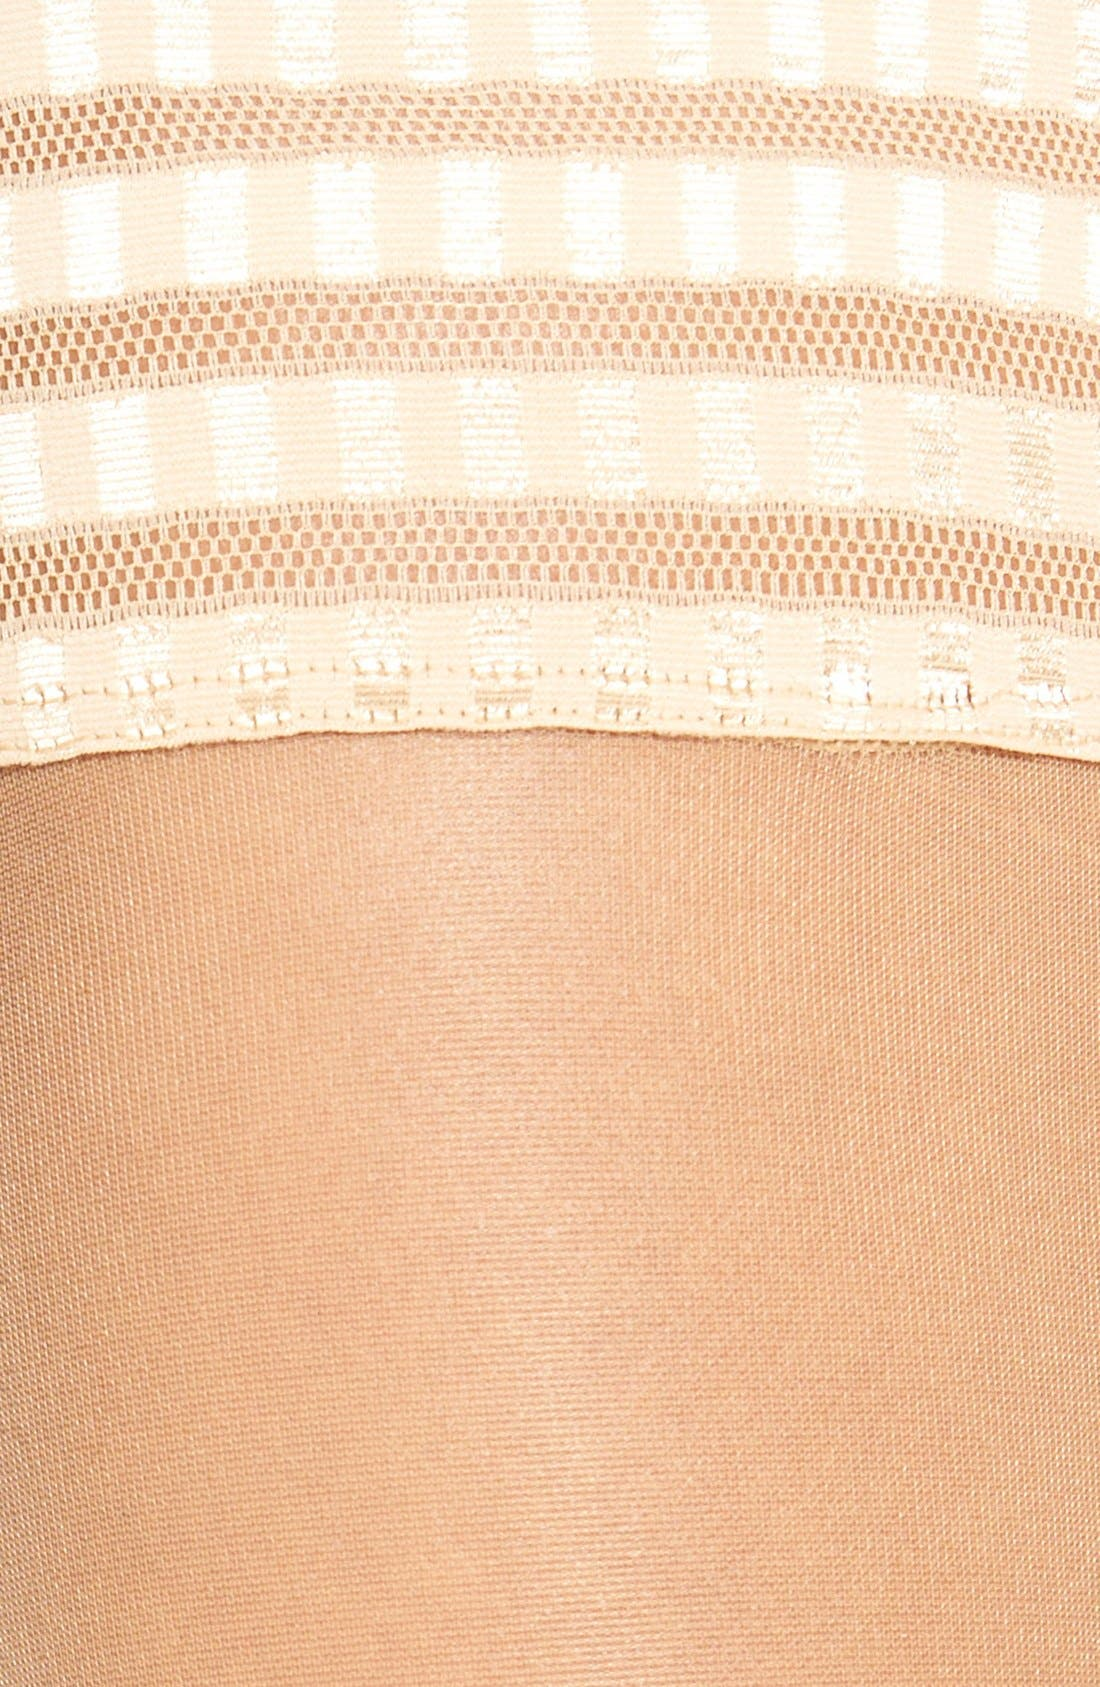 Alternate Image 3  - Falke 'Pure Matt 20' Stay-Up Stockings